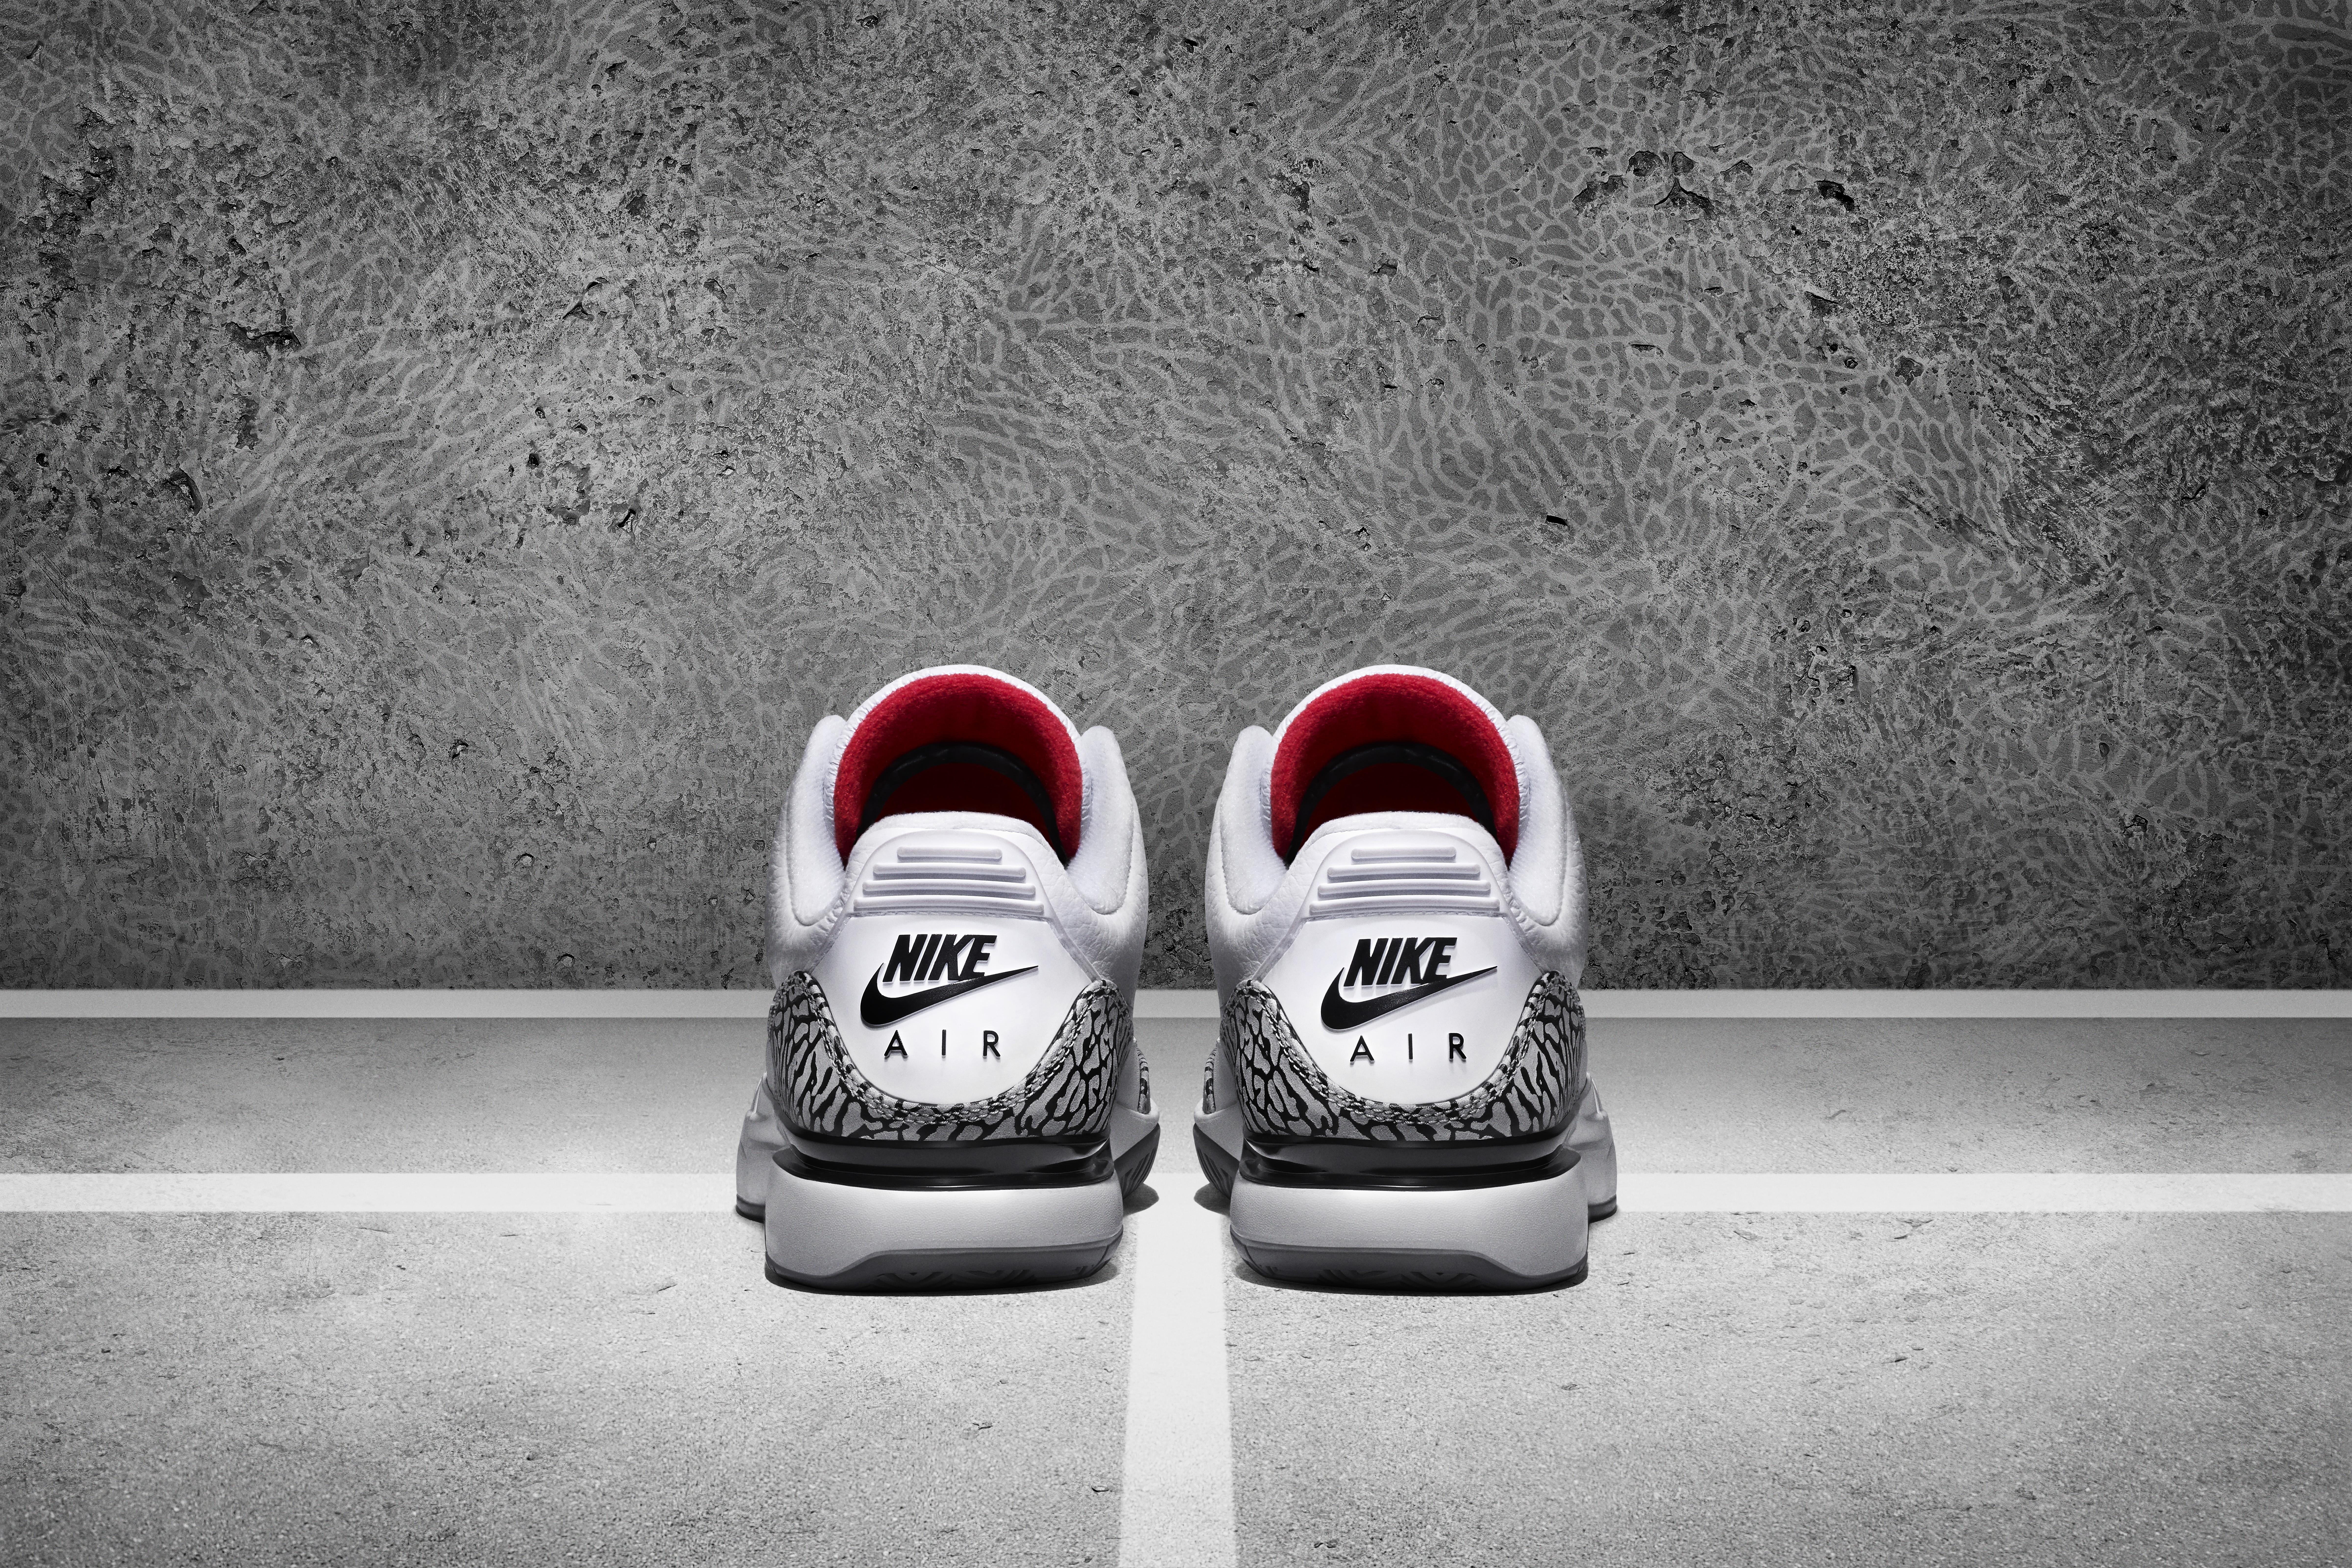 688e0dd3002 ... Air Jordan Collaboration LO · HI Roger Federer wearing NikeCourt Zoom  Vapor ...